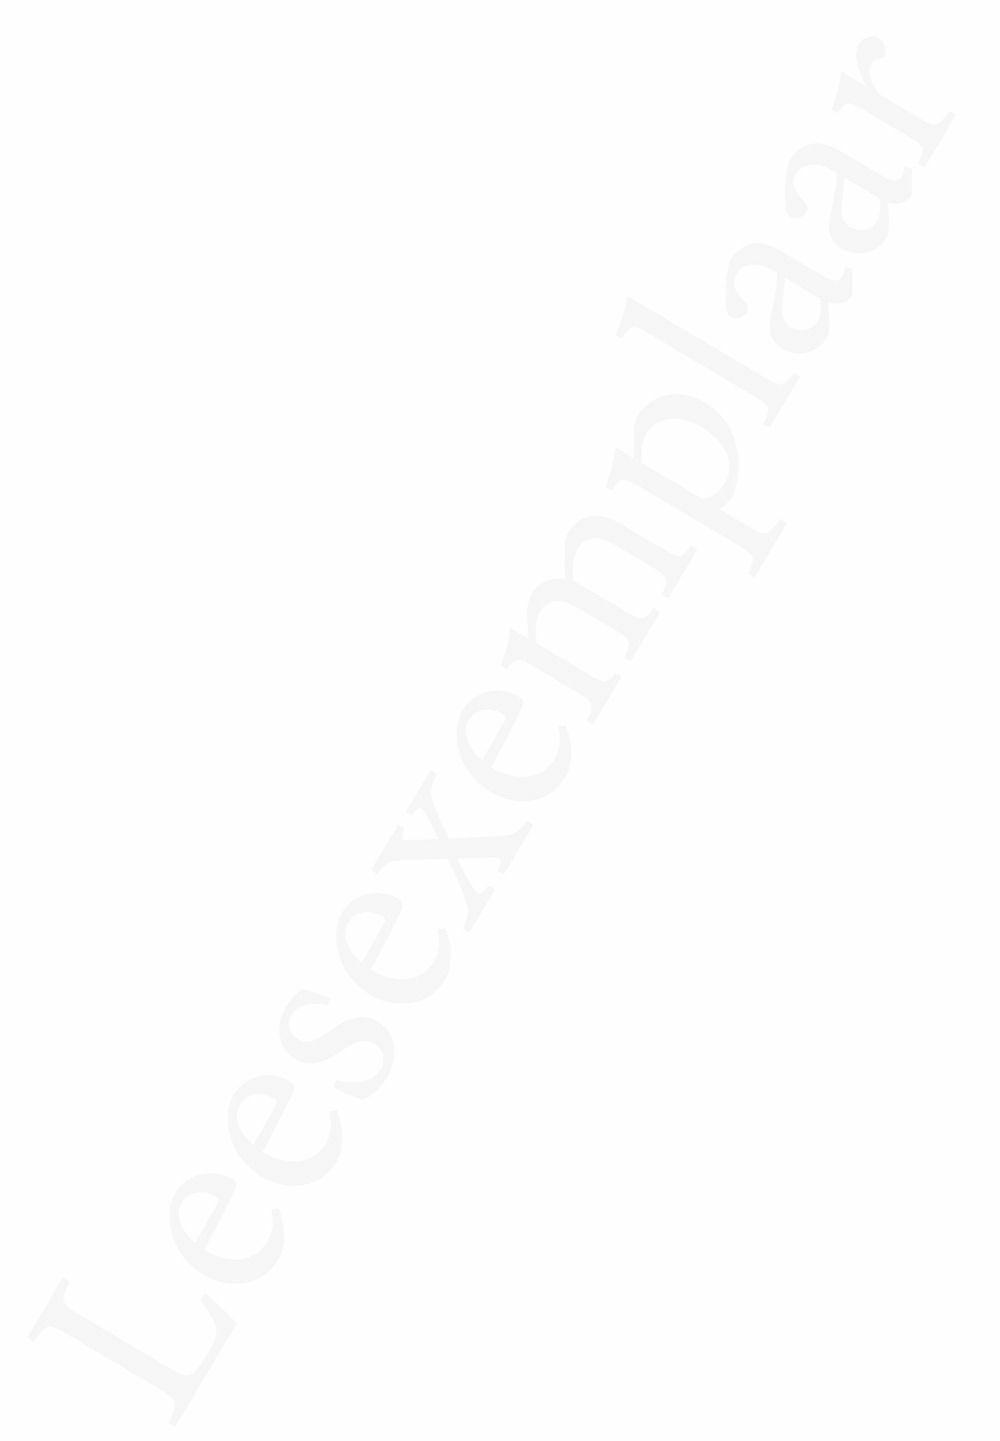 Preview: Lezer-scan